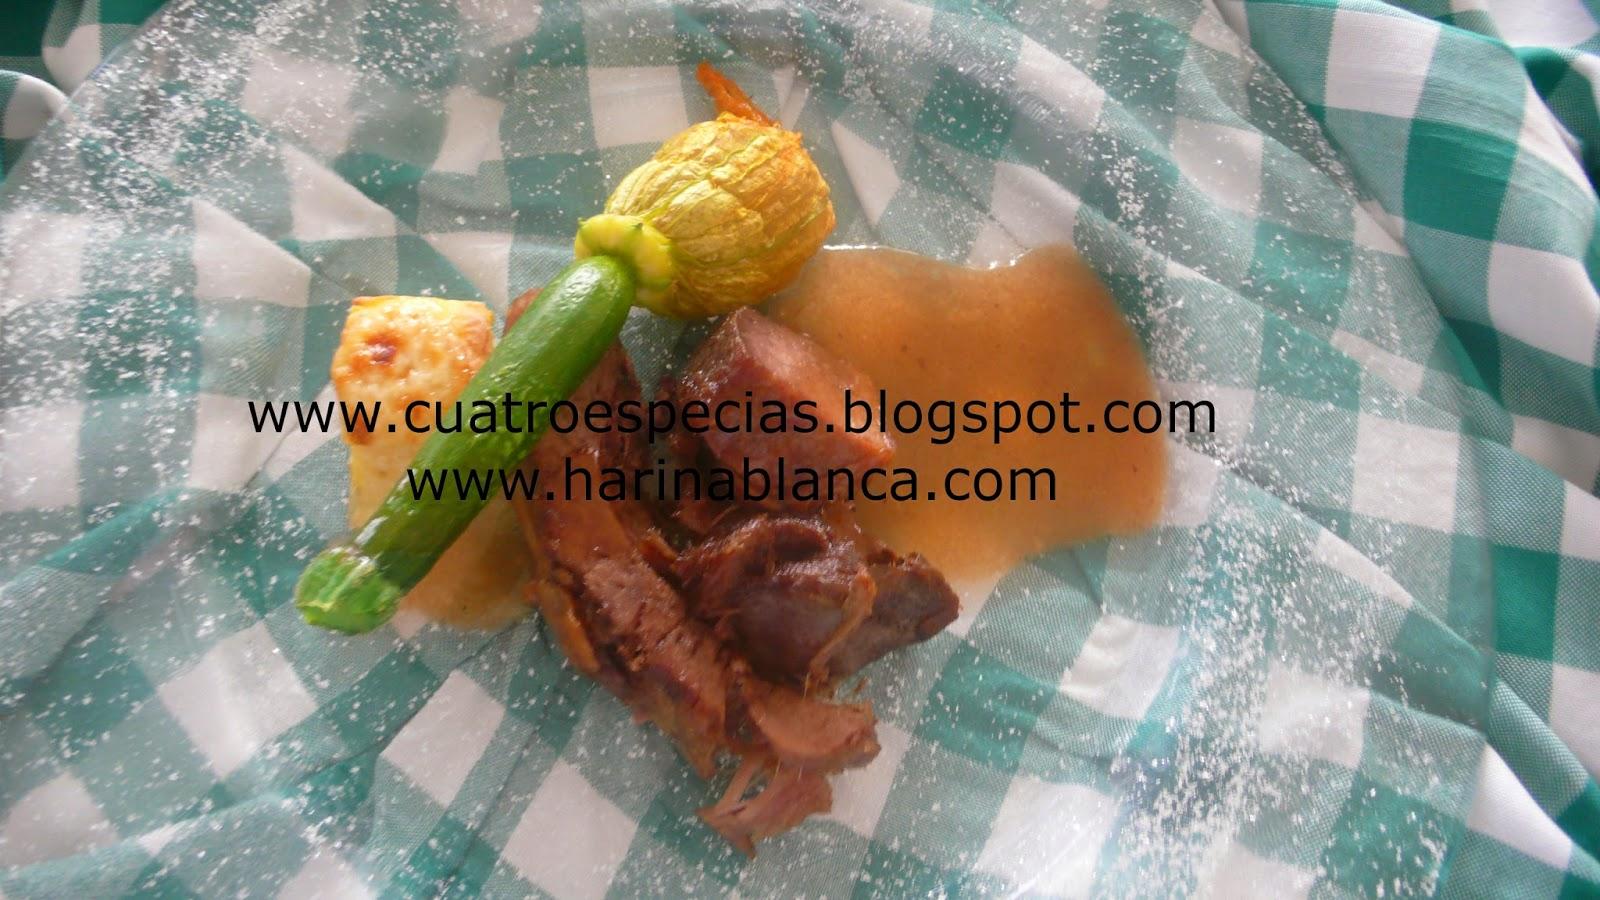 www.cuatroespecias.blogspot.com. jabalí con calabacines al horno